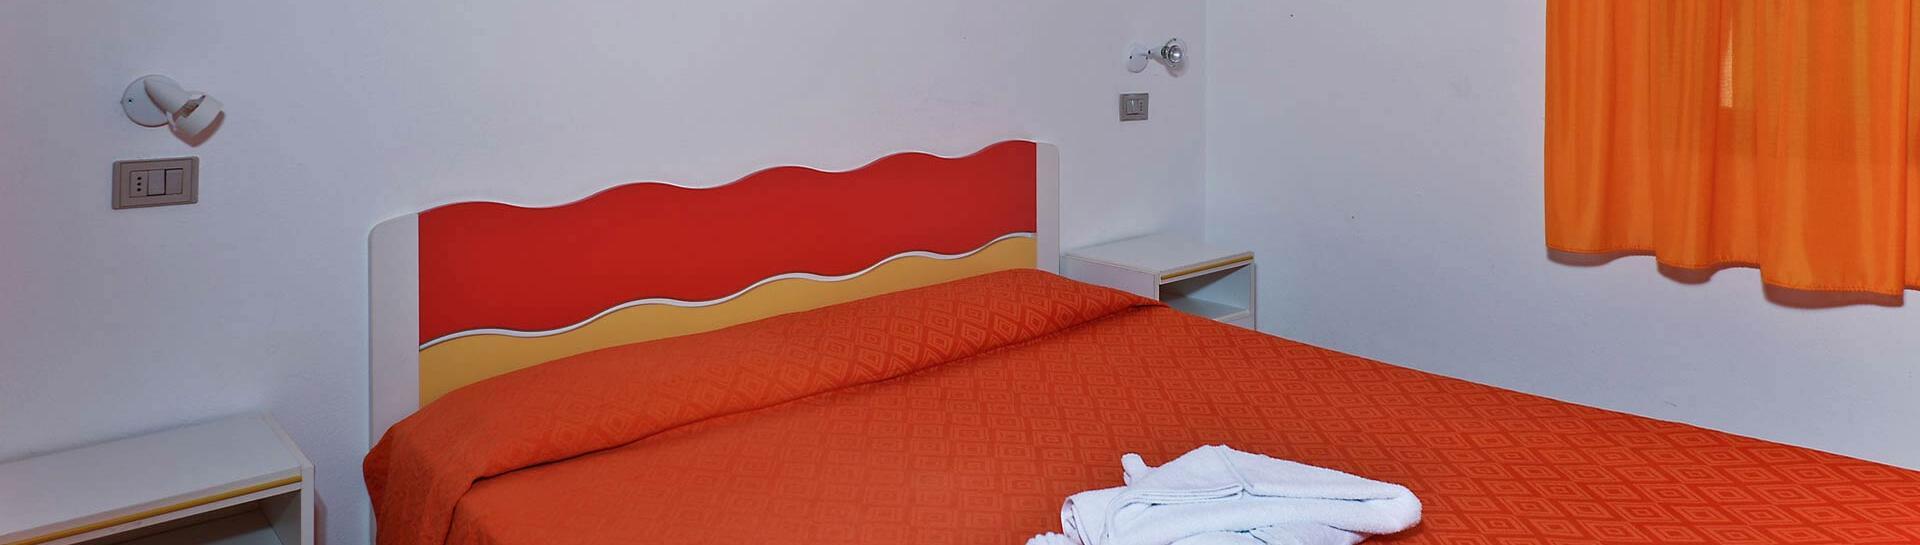 4mori de pool-zweizimmer 011